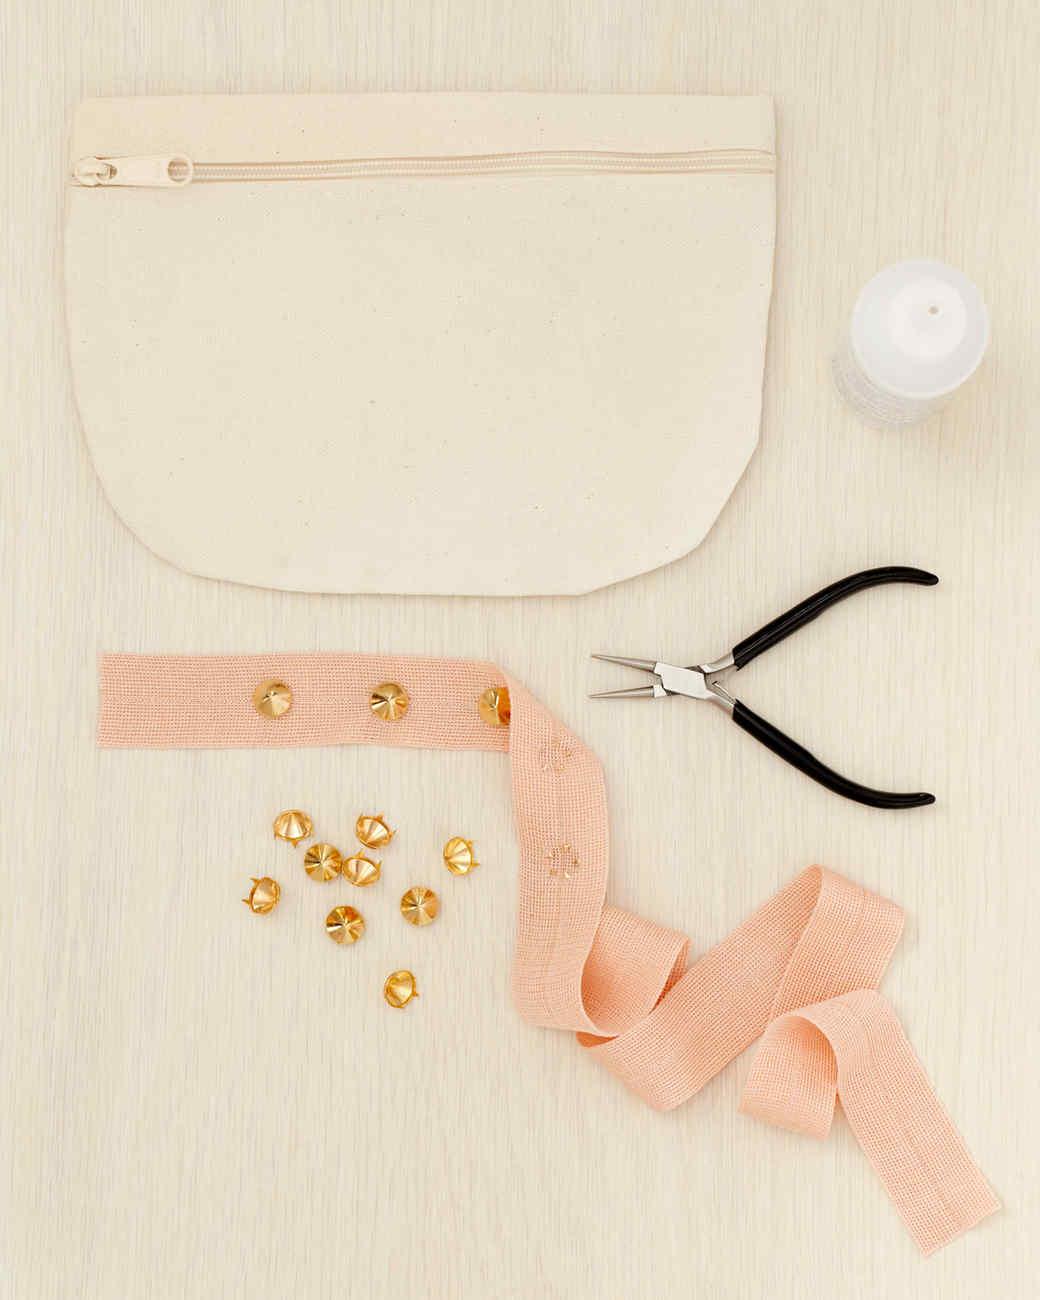 studded-bag-how-to-wld109036.jpg